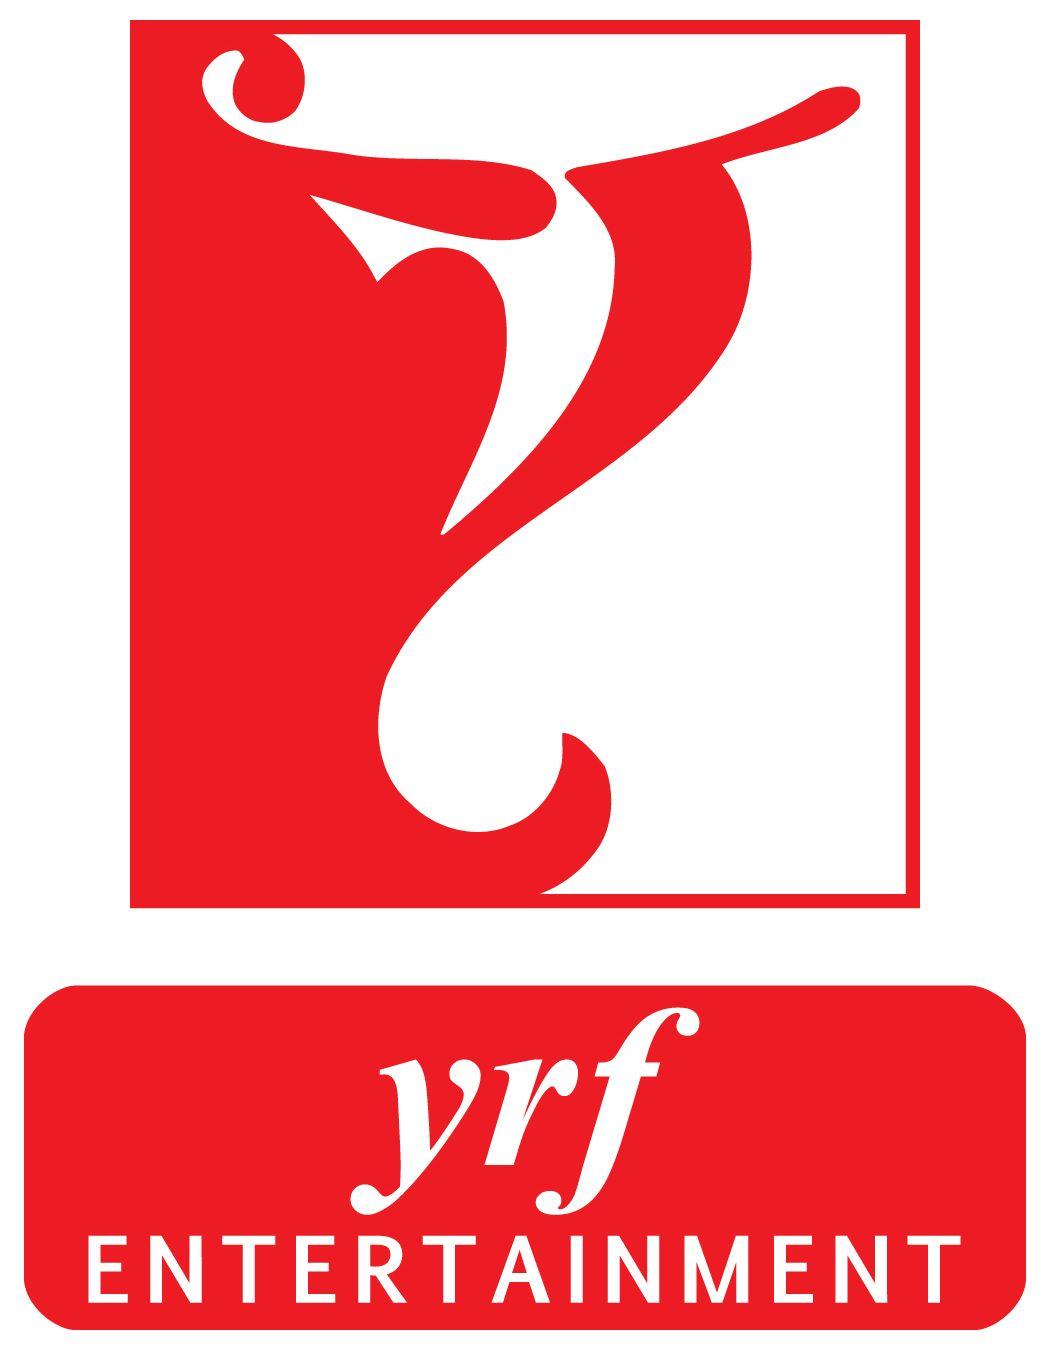 The Yash Raj Legacy Films, TV, Entertainment, Music